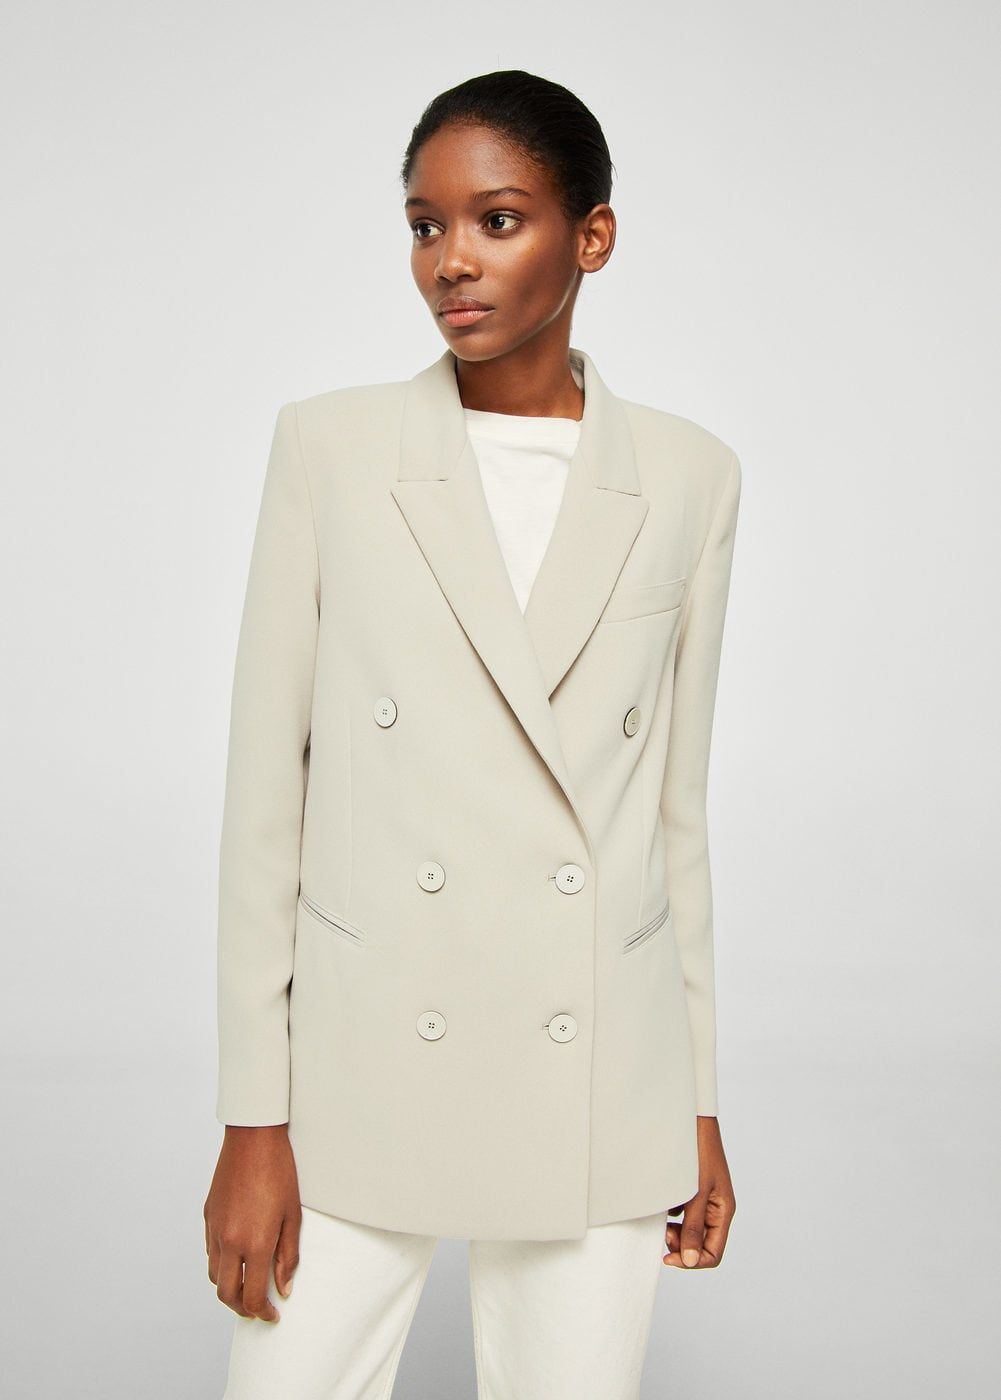 Americana costuras contraste Mujer | MODA . Low Cost